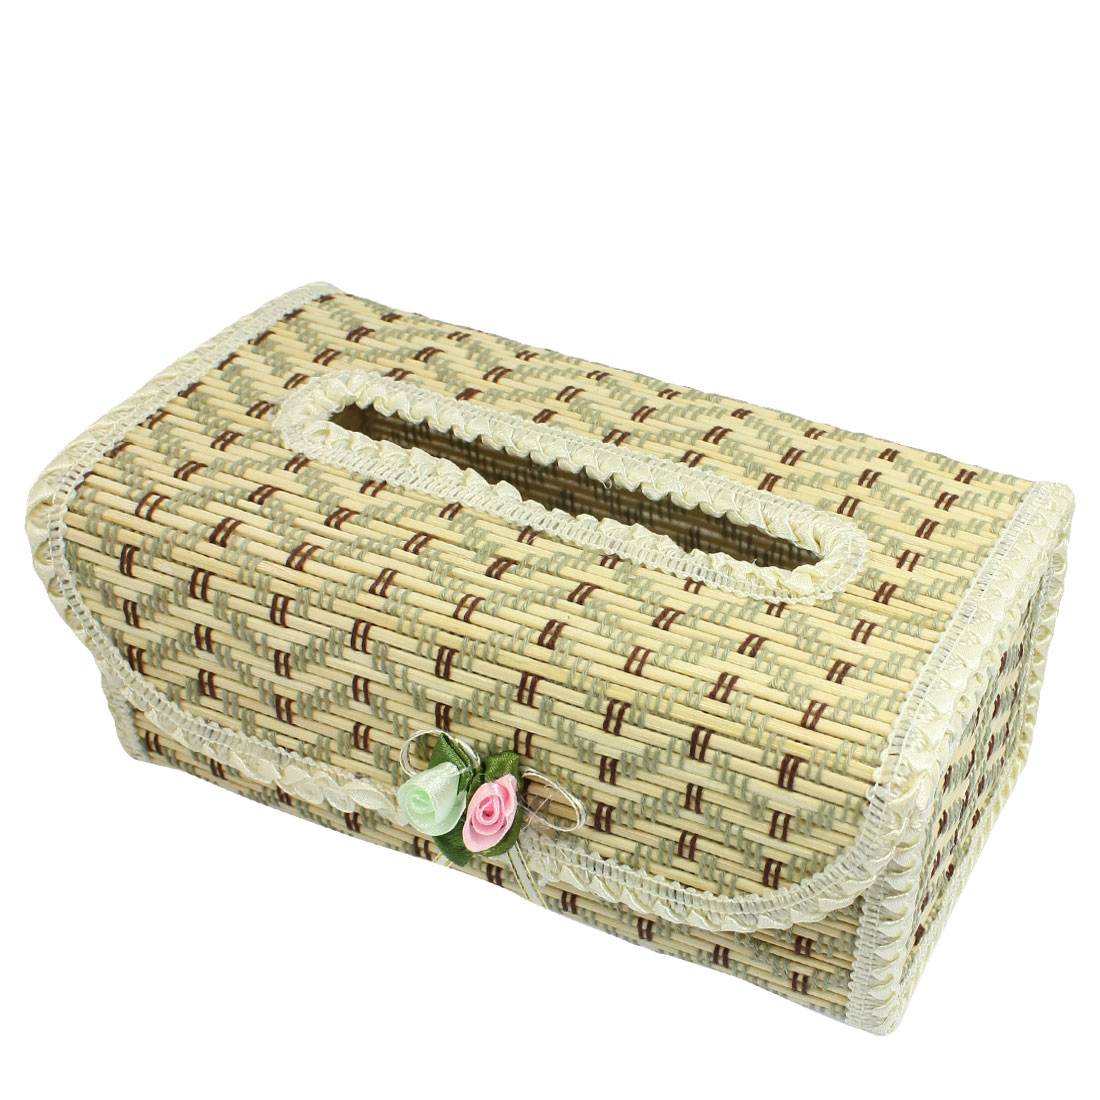 Zigzag Pattern Flower Decor Bamboo Handmade Tissue Box Cover Holder